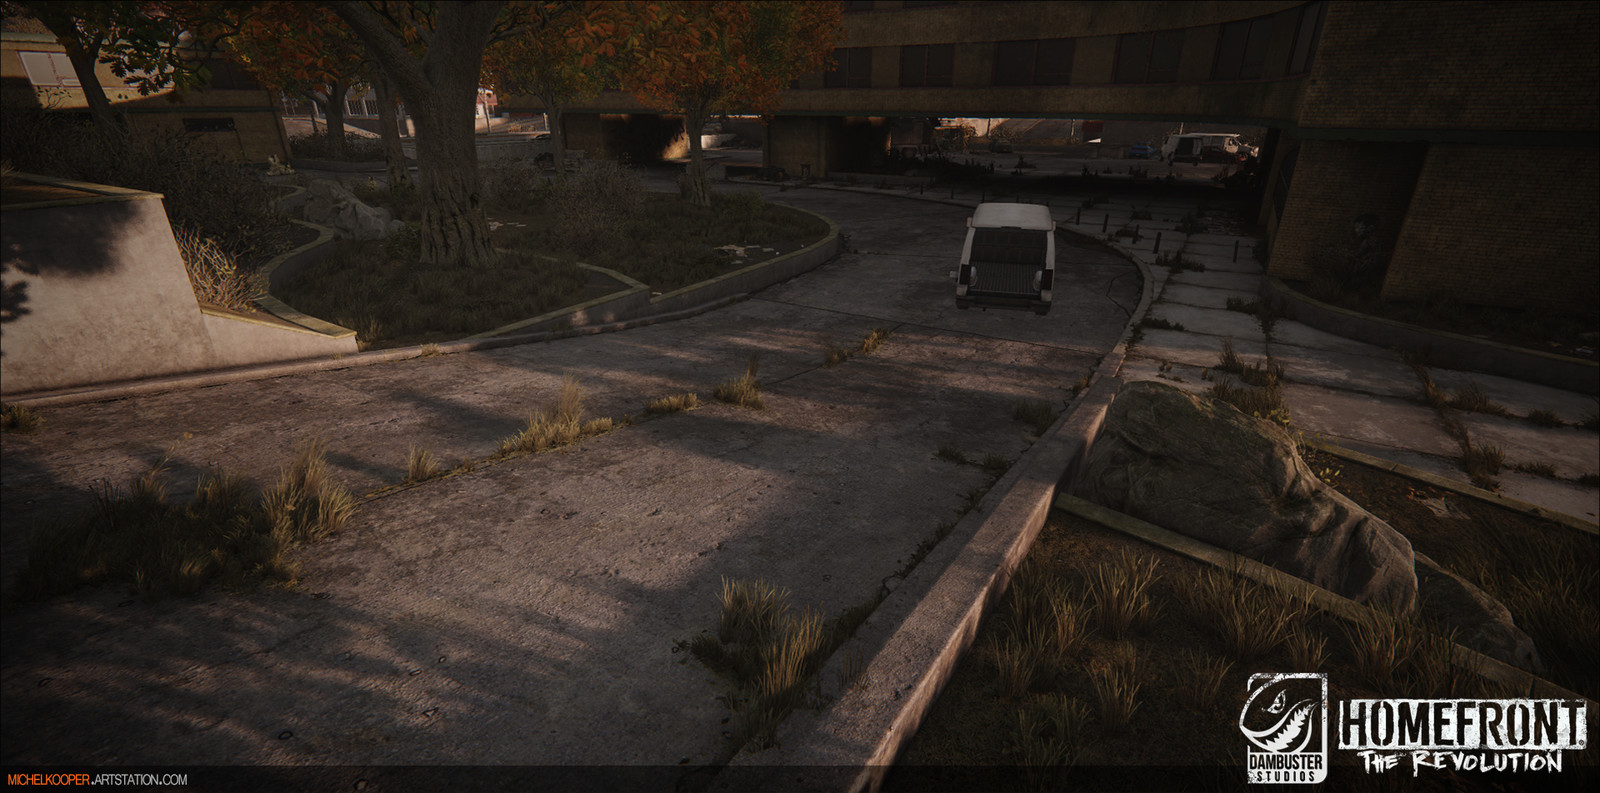 driveway/planters & Level art